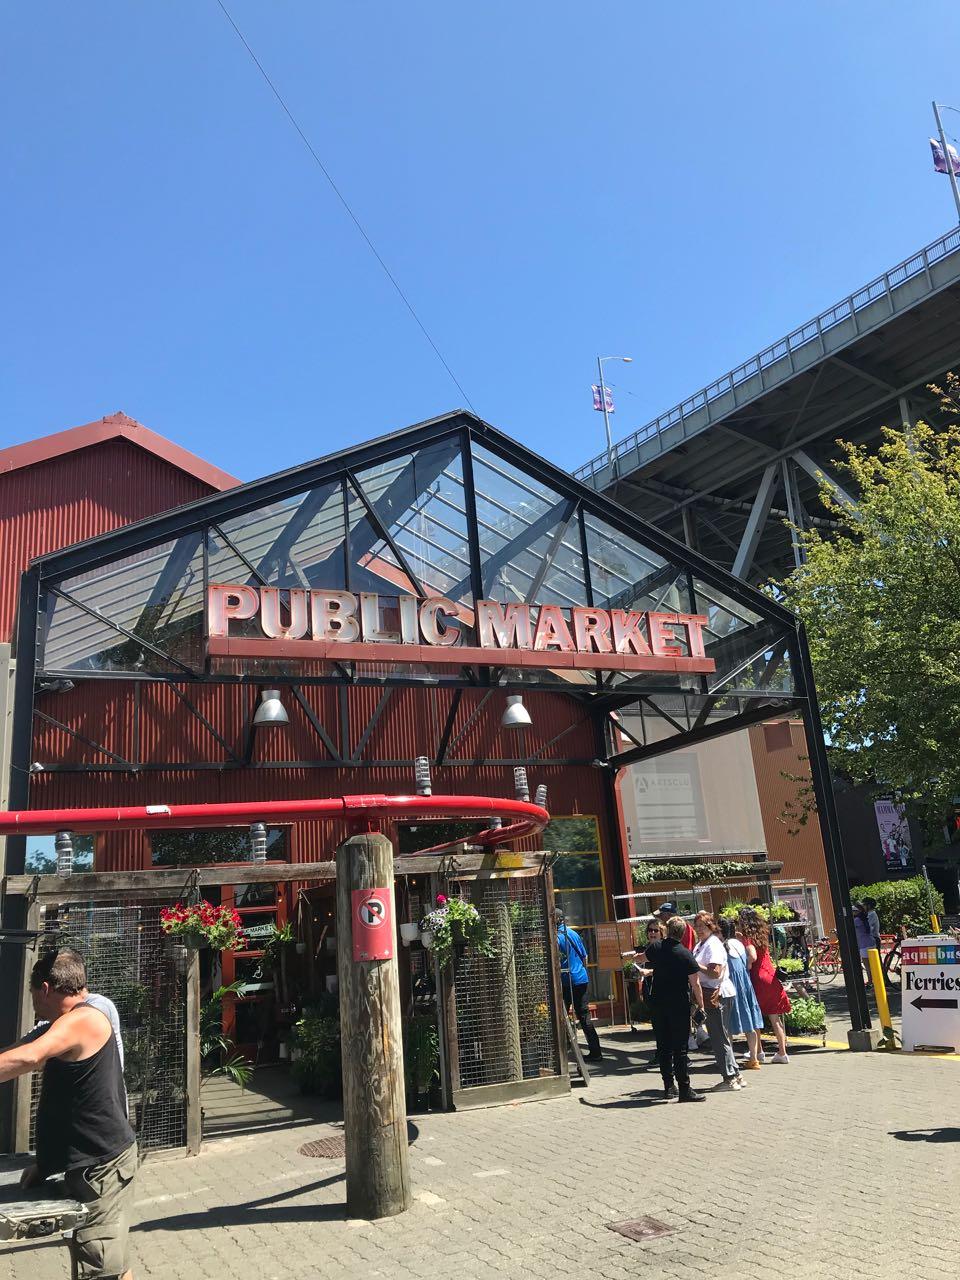 Public Market Granville Island.jpg